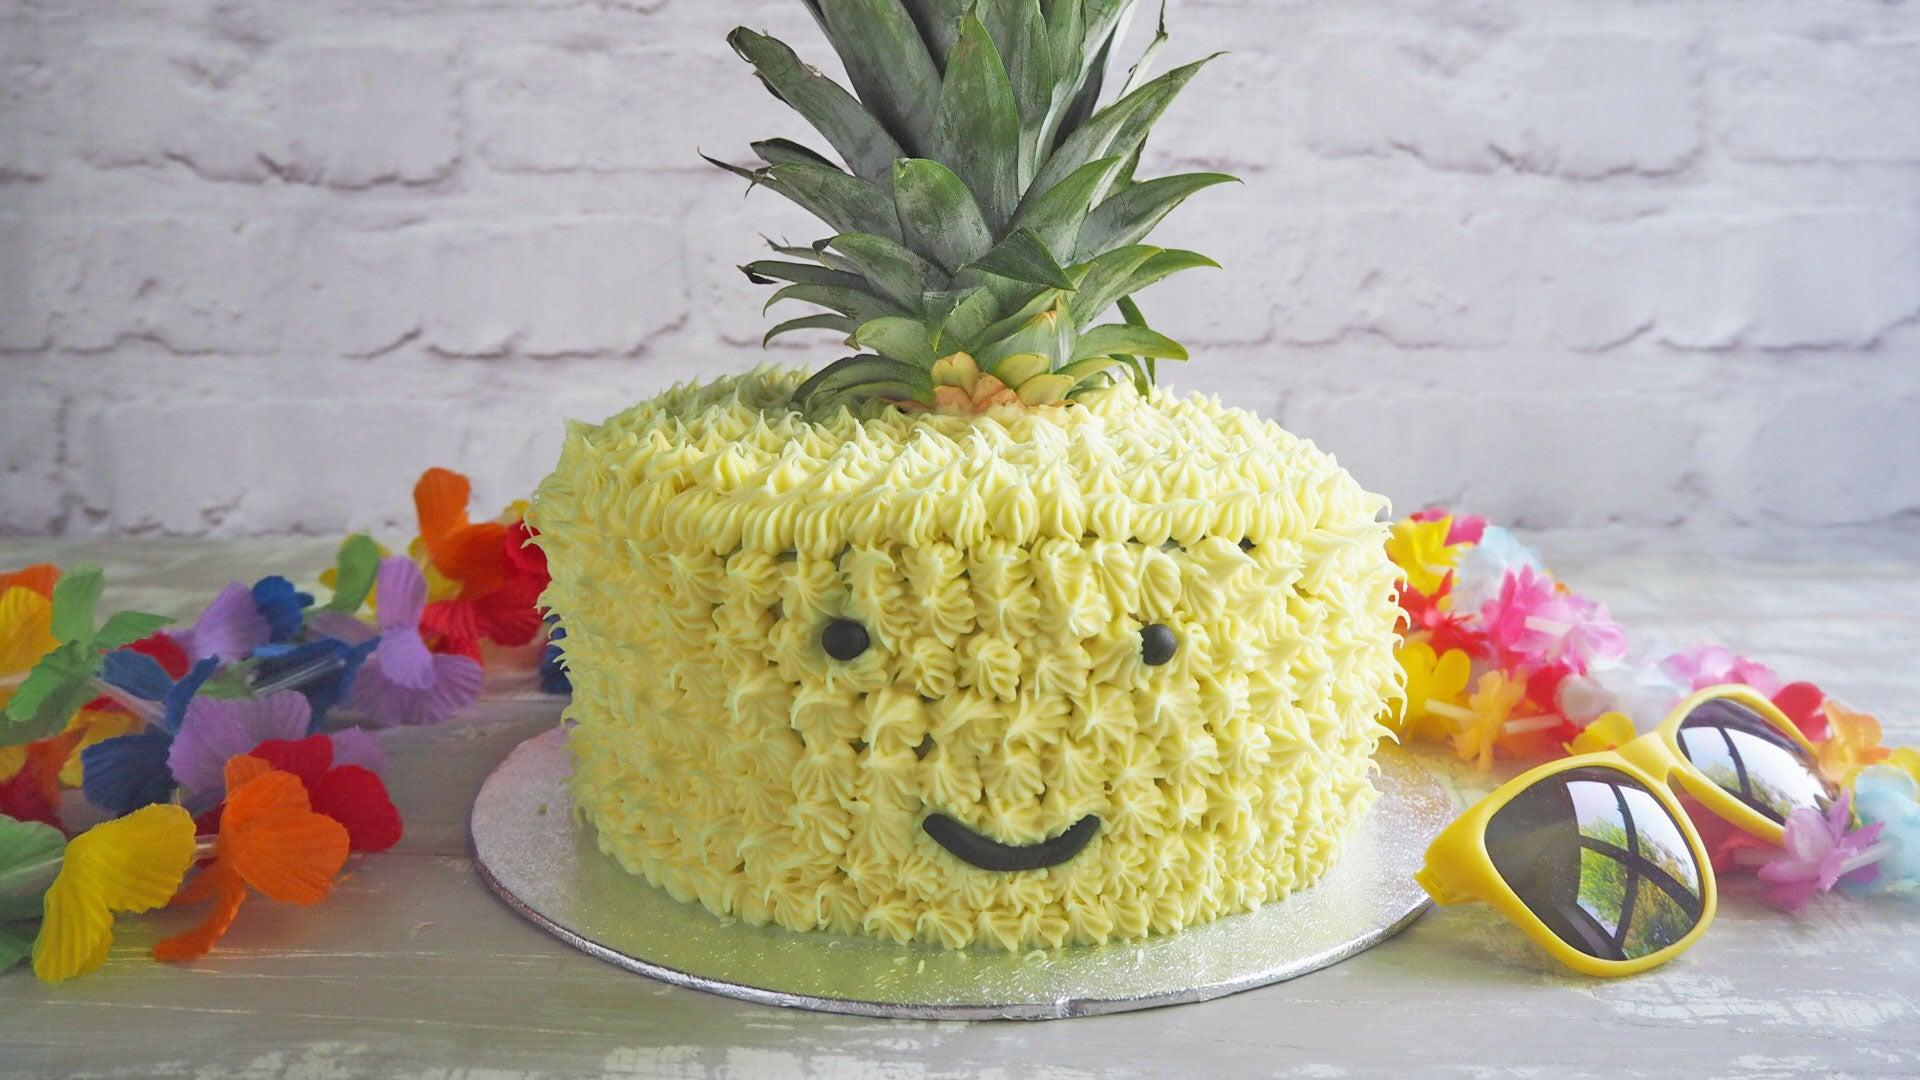 Pineapple Fiesta Cake